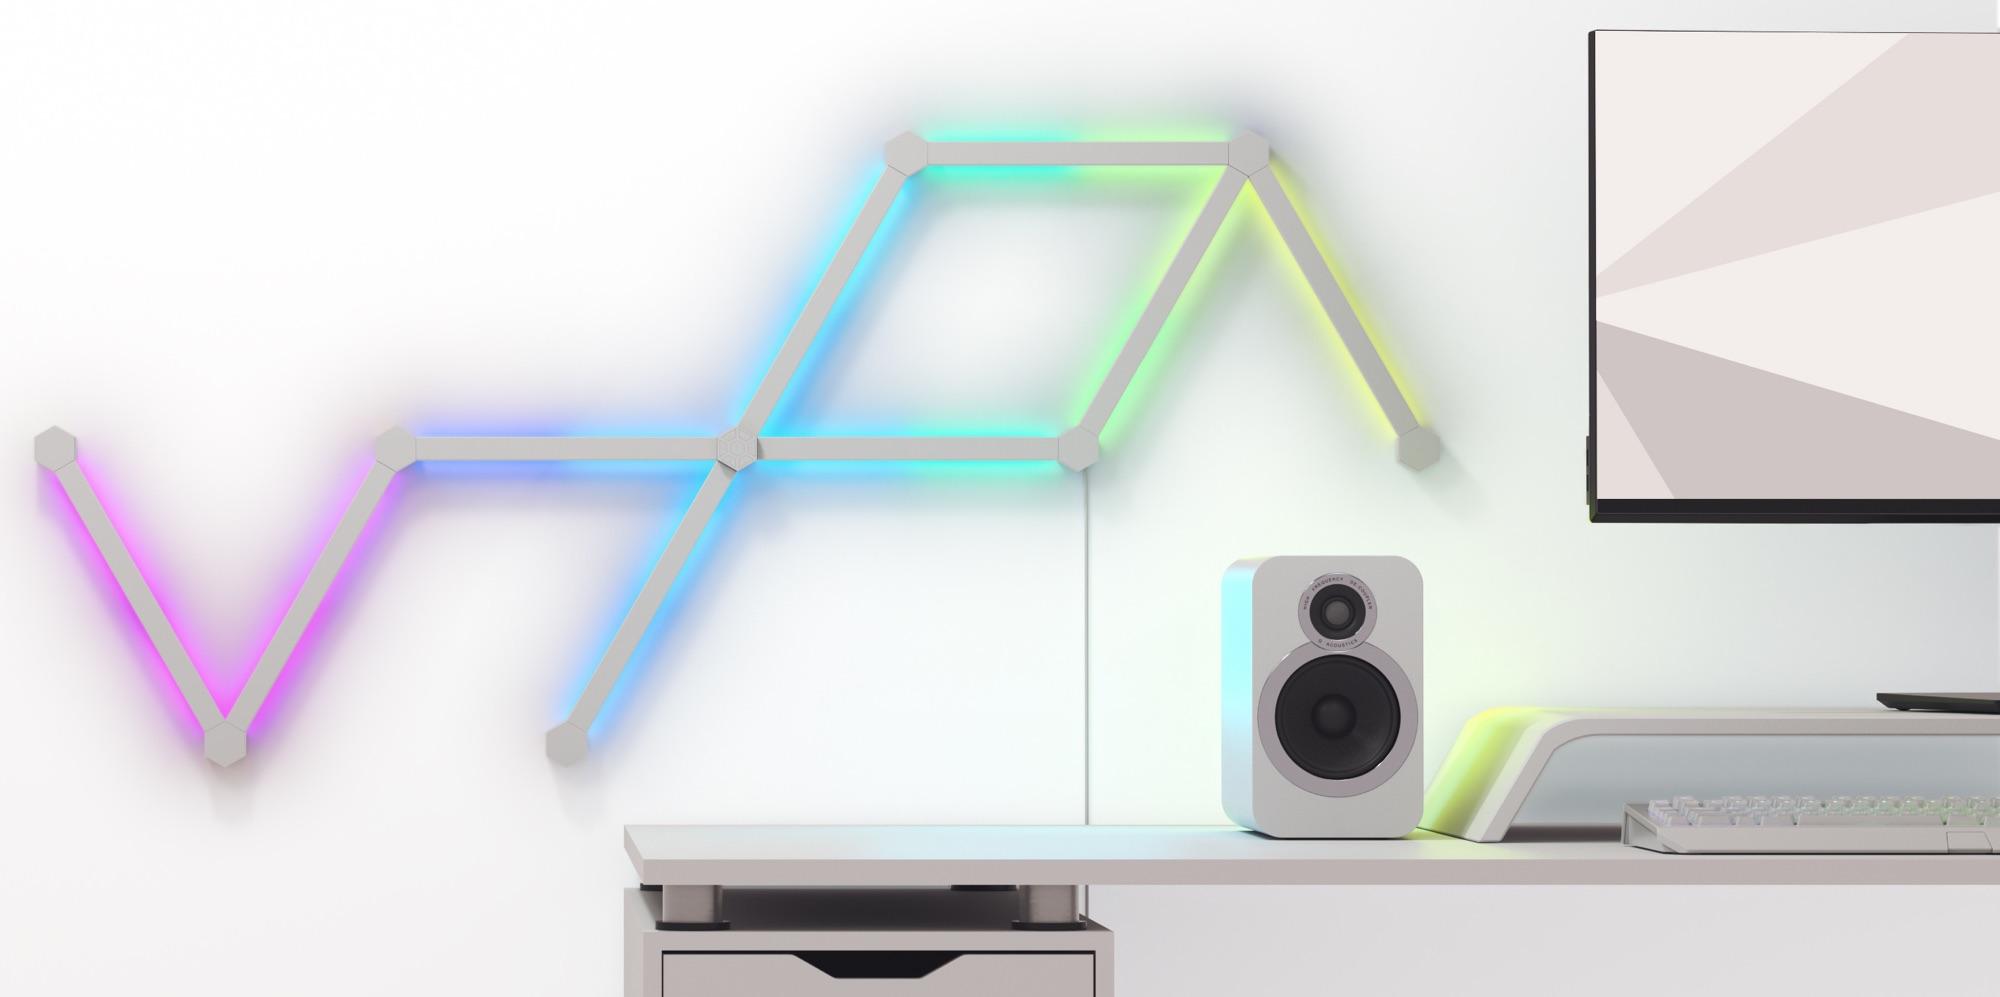 Nanoleaf Launches HomeKit-Enabled 'Lines' LED Light Bars